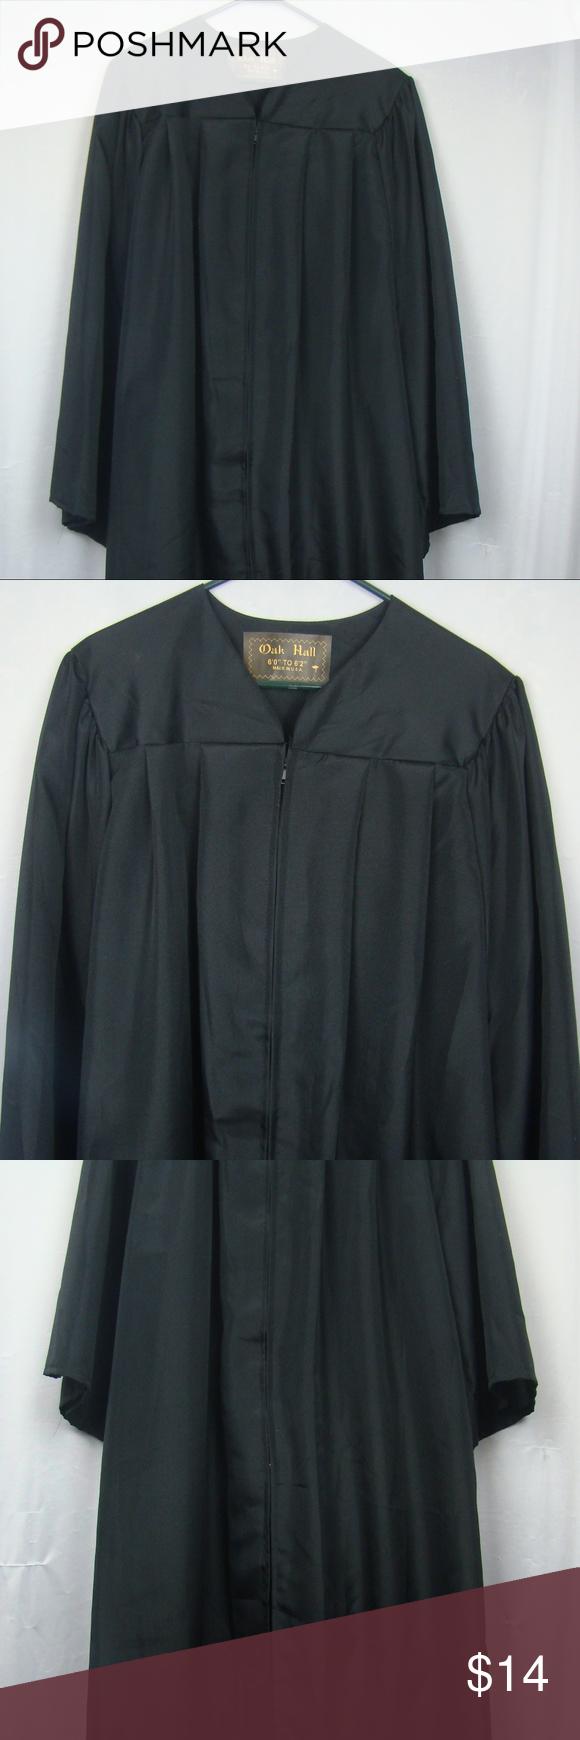 Oak Hall Graduation Gown Men\'s Or Women\'s 6\'-6\'2\